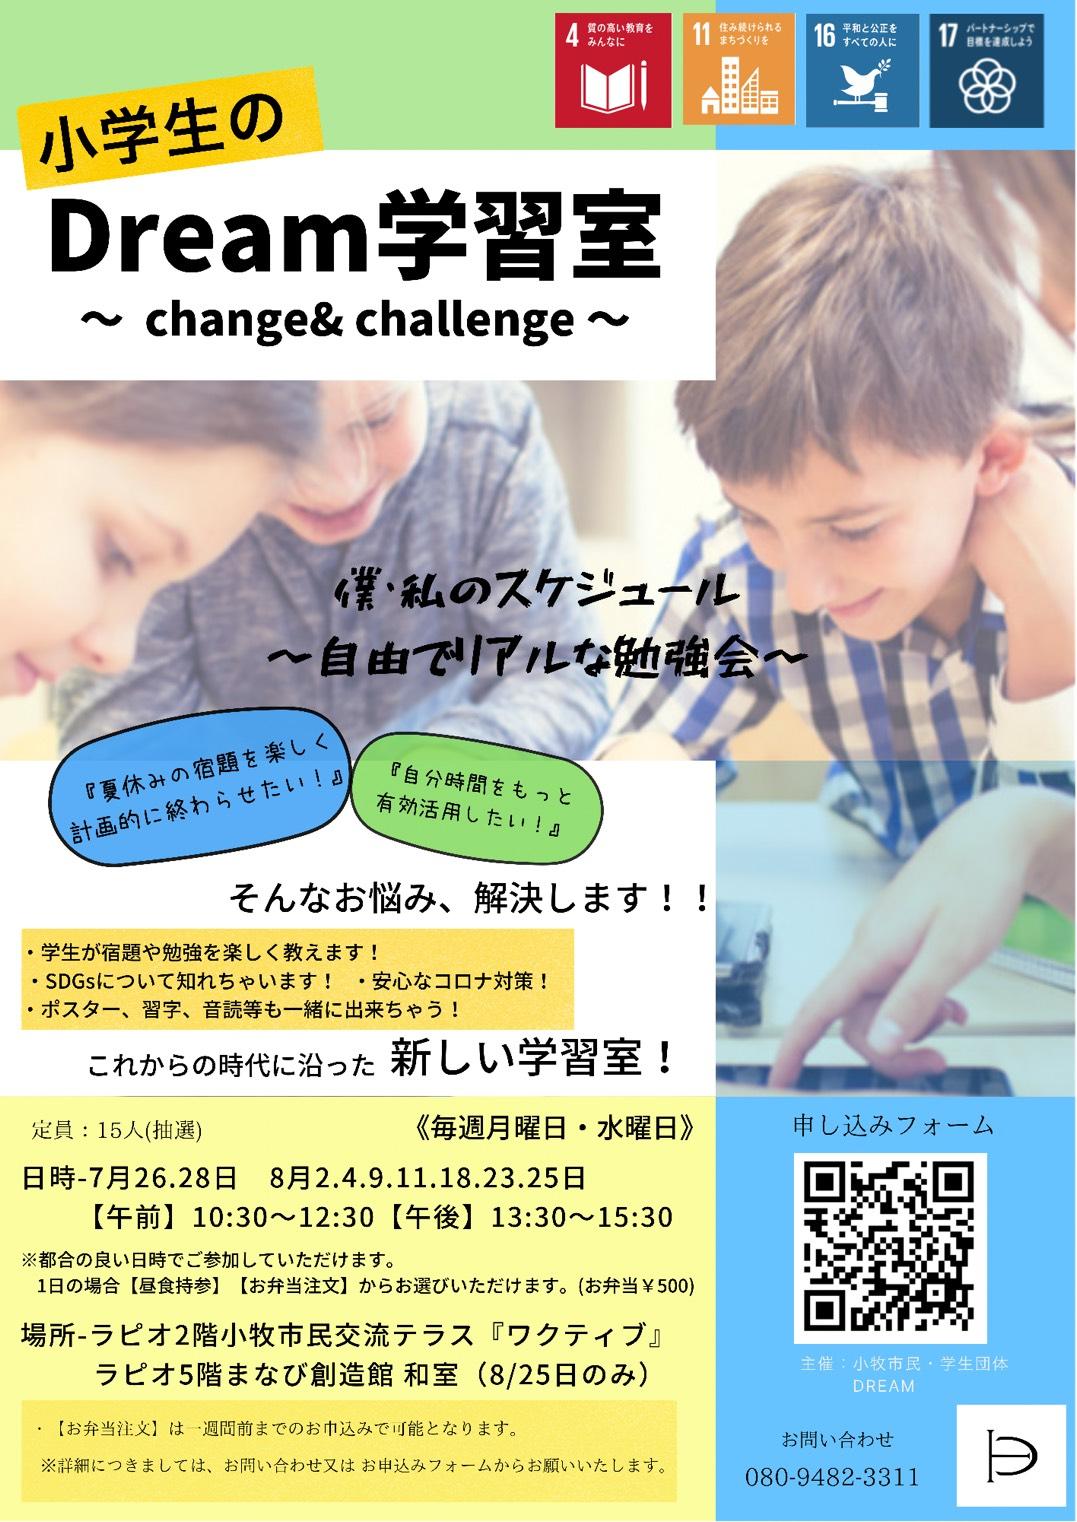 Dream学習会参加者募集チラシ